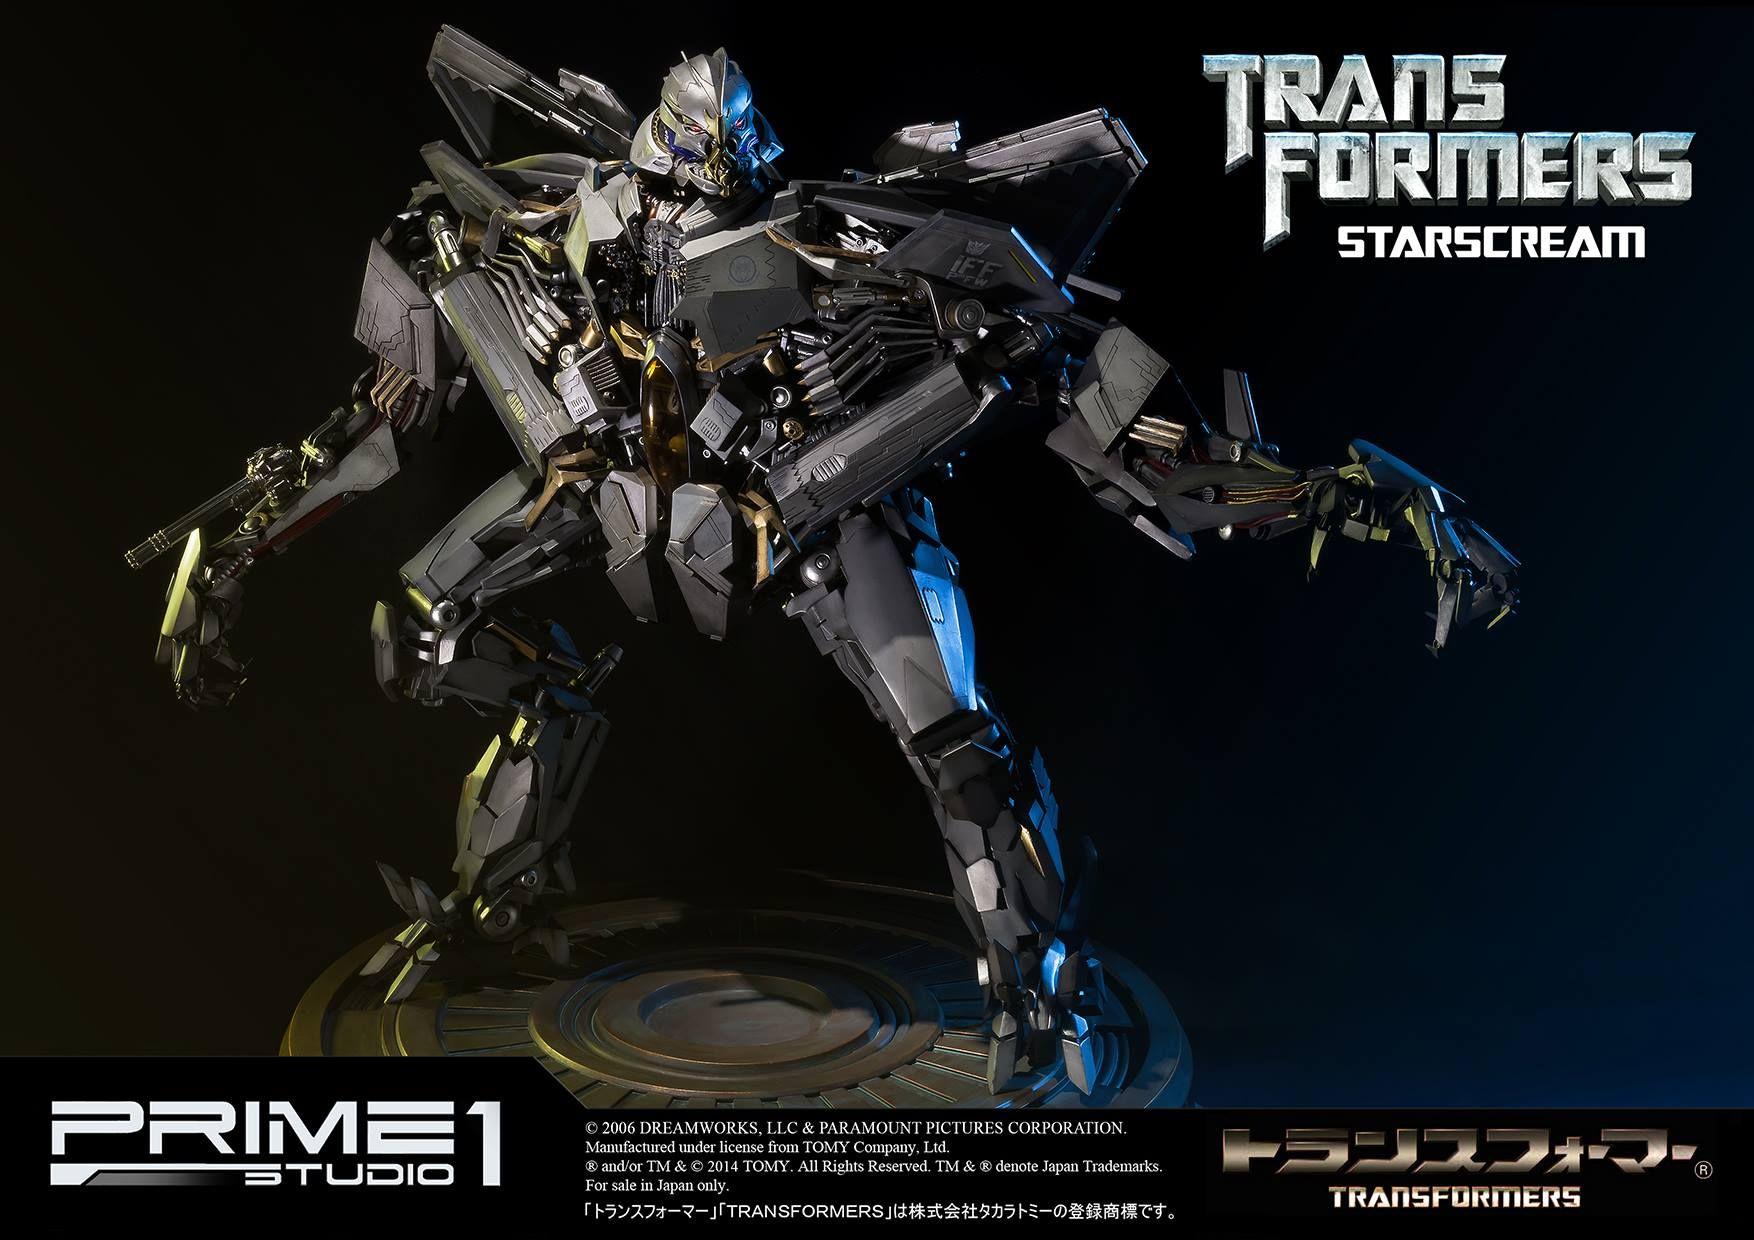 Mmtfm 03 Starscream Transformers 2007 Facebook Transformers Starscream Transformers Transformers Collection